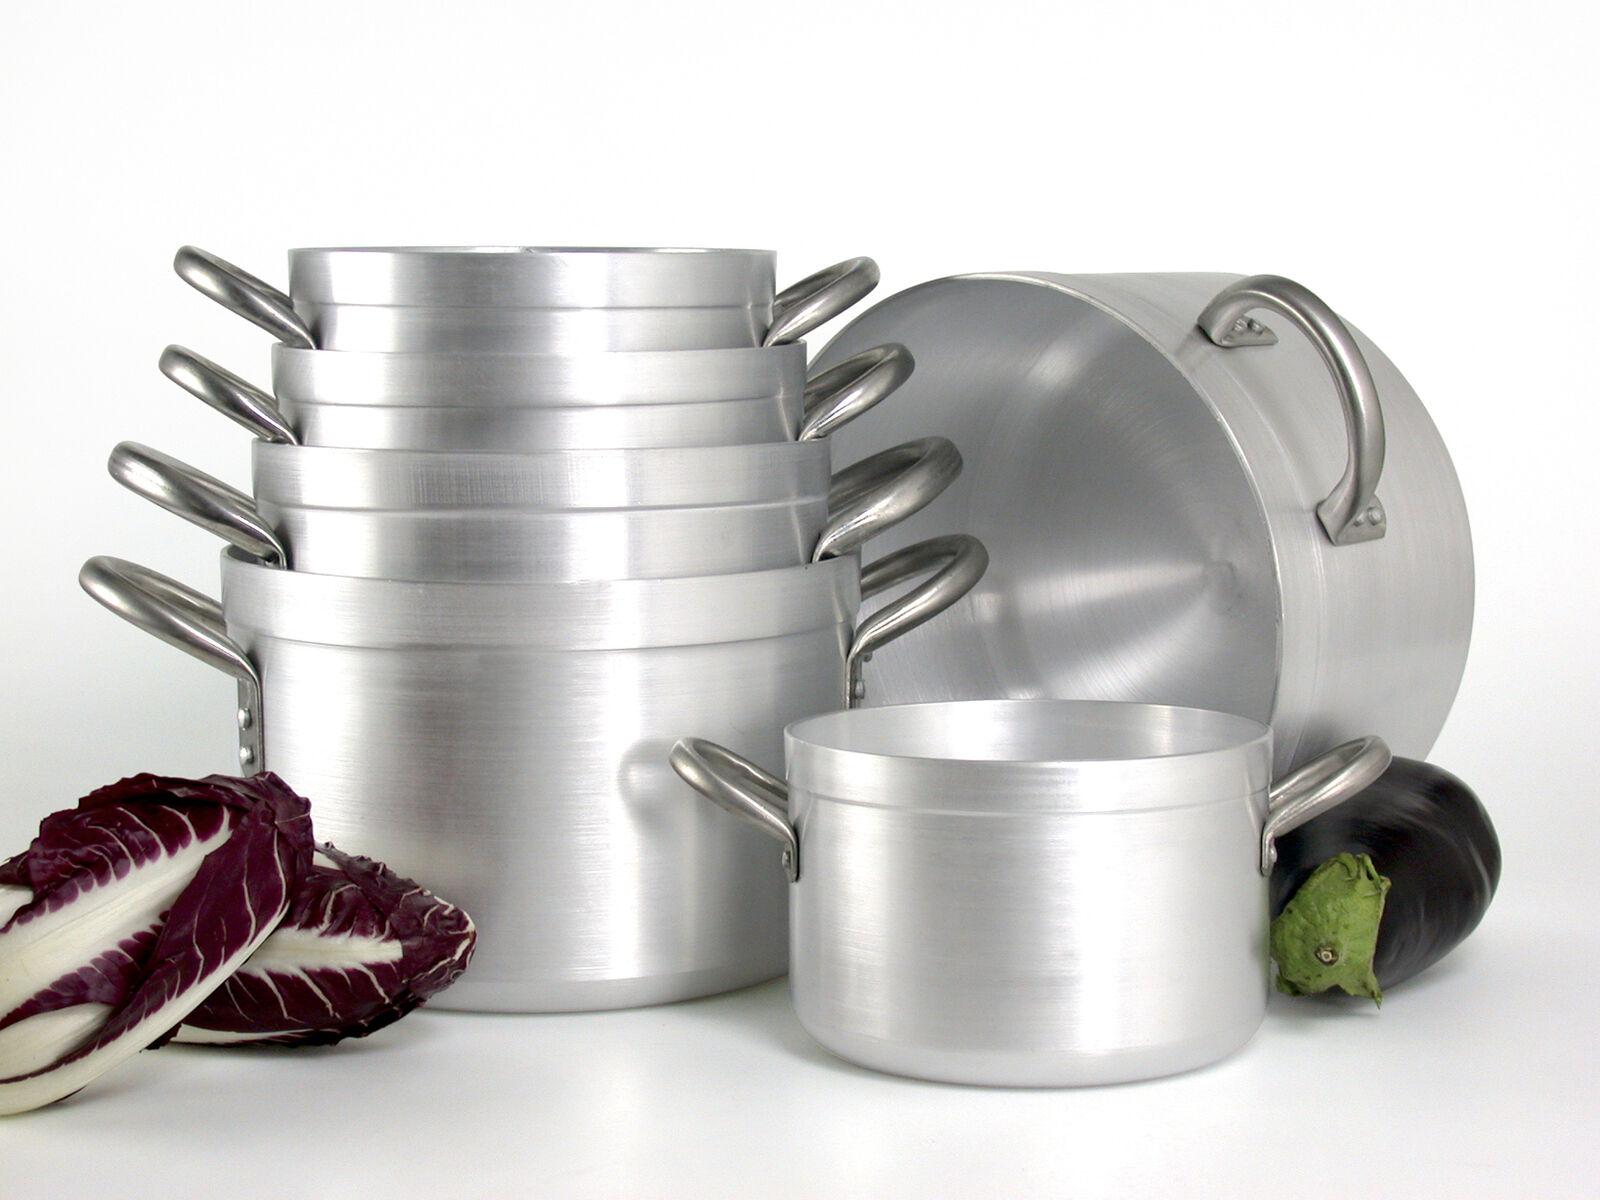 PARDINI Casseruola alluminio albergo alta 2 manici 15 pentola da cucina